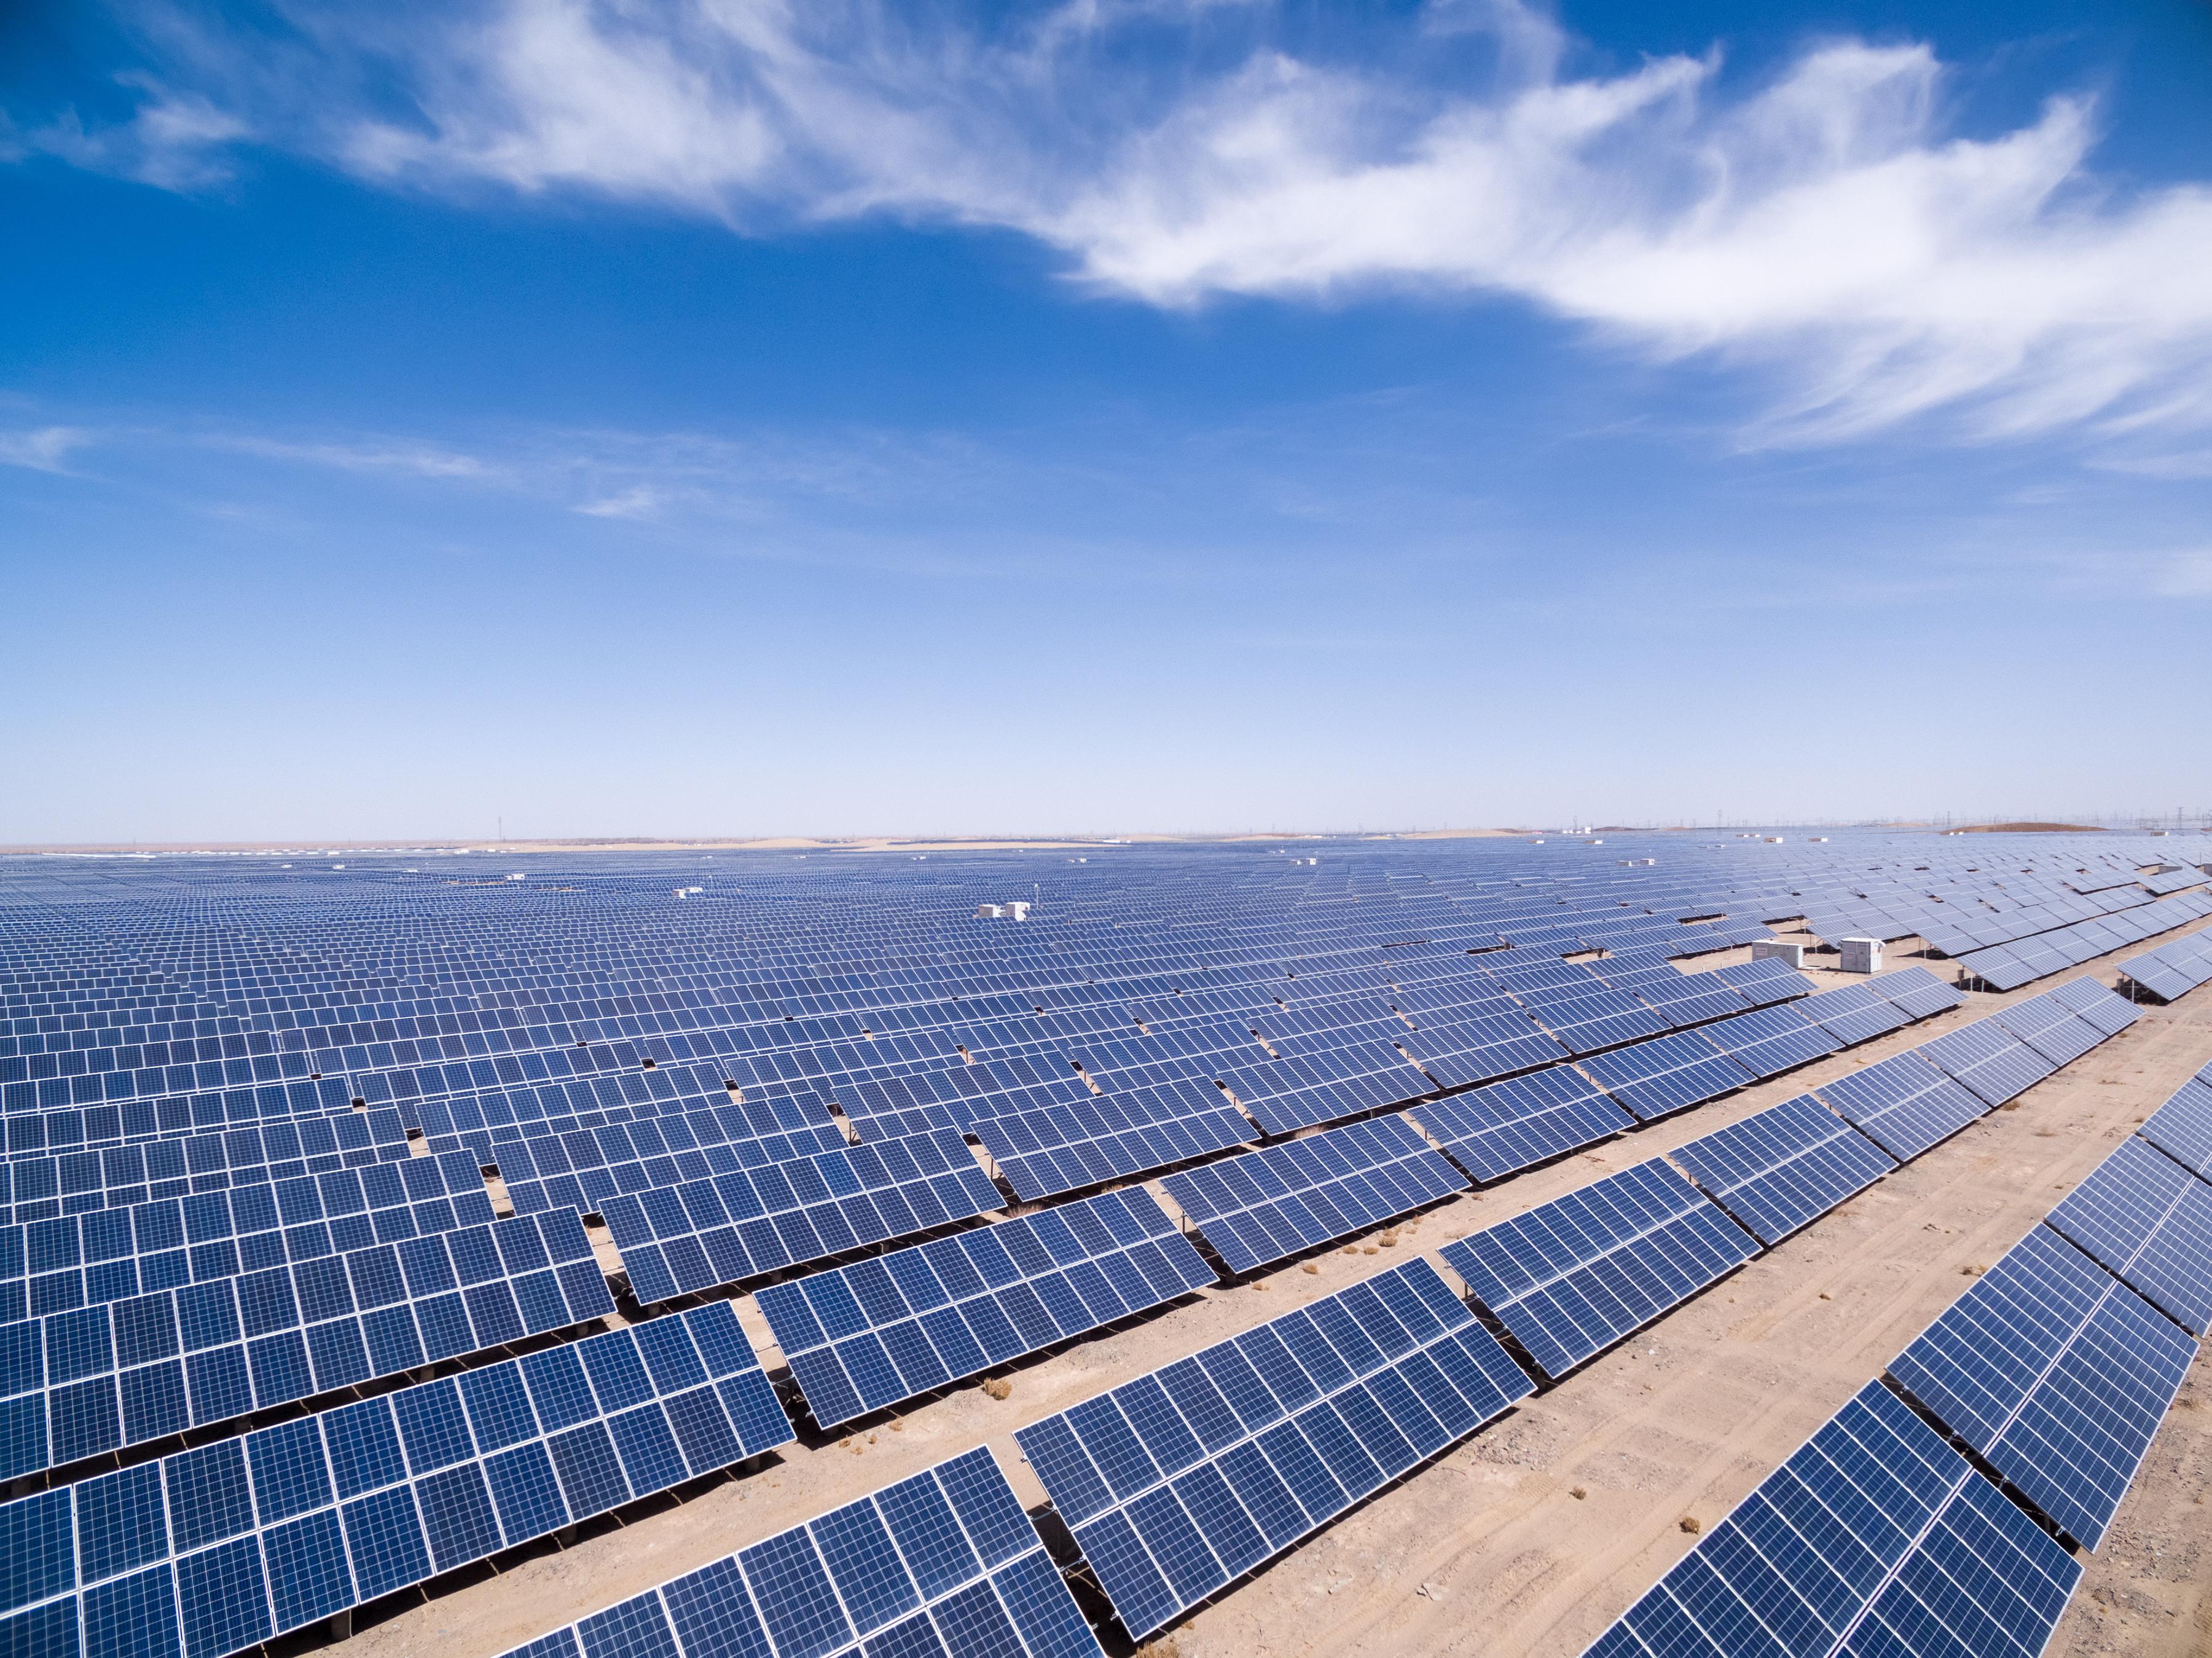 Large solar installation in the desert.